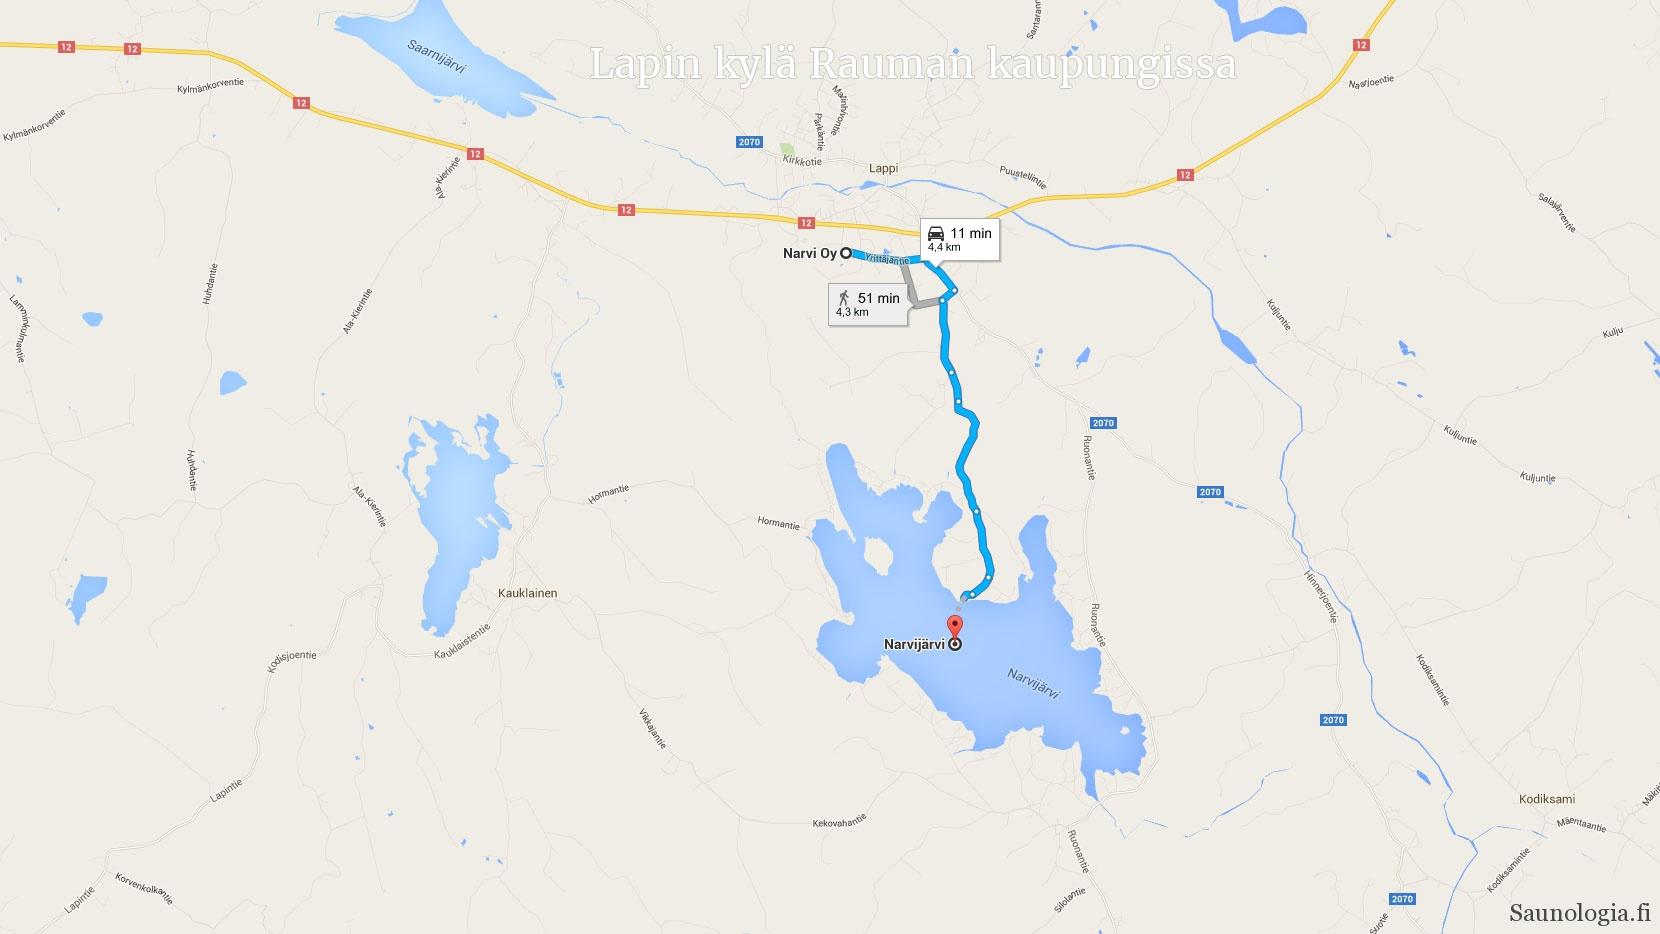 1606012-Lappi_ja_Narvi_jarven_kartta_Google_maps_